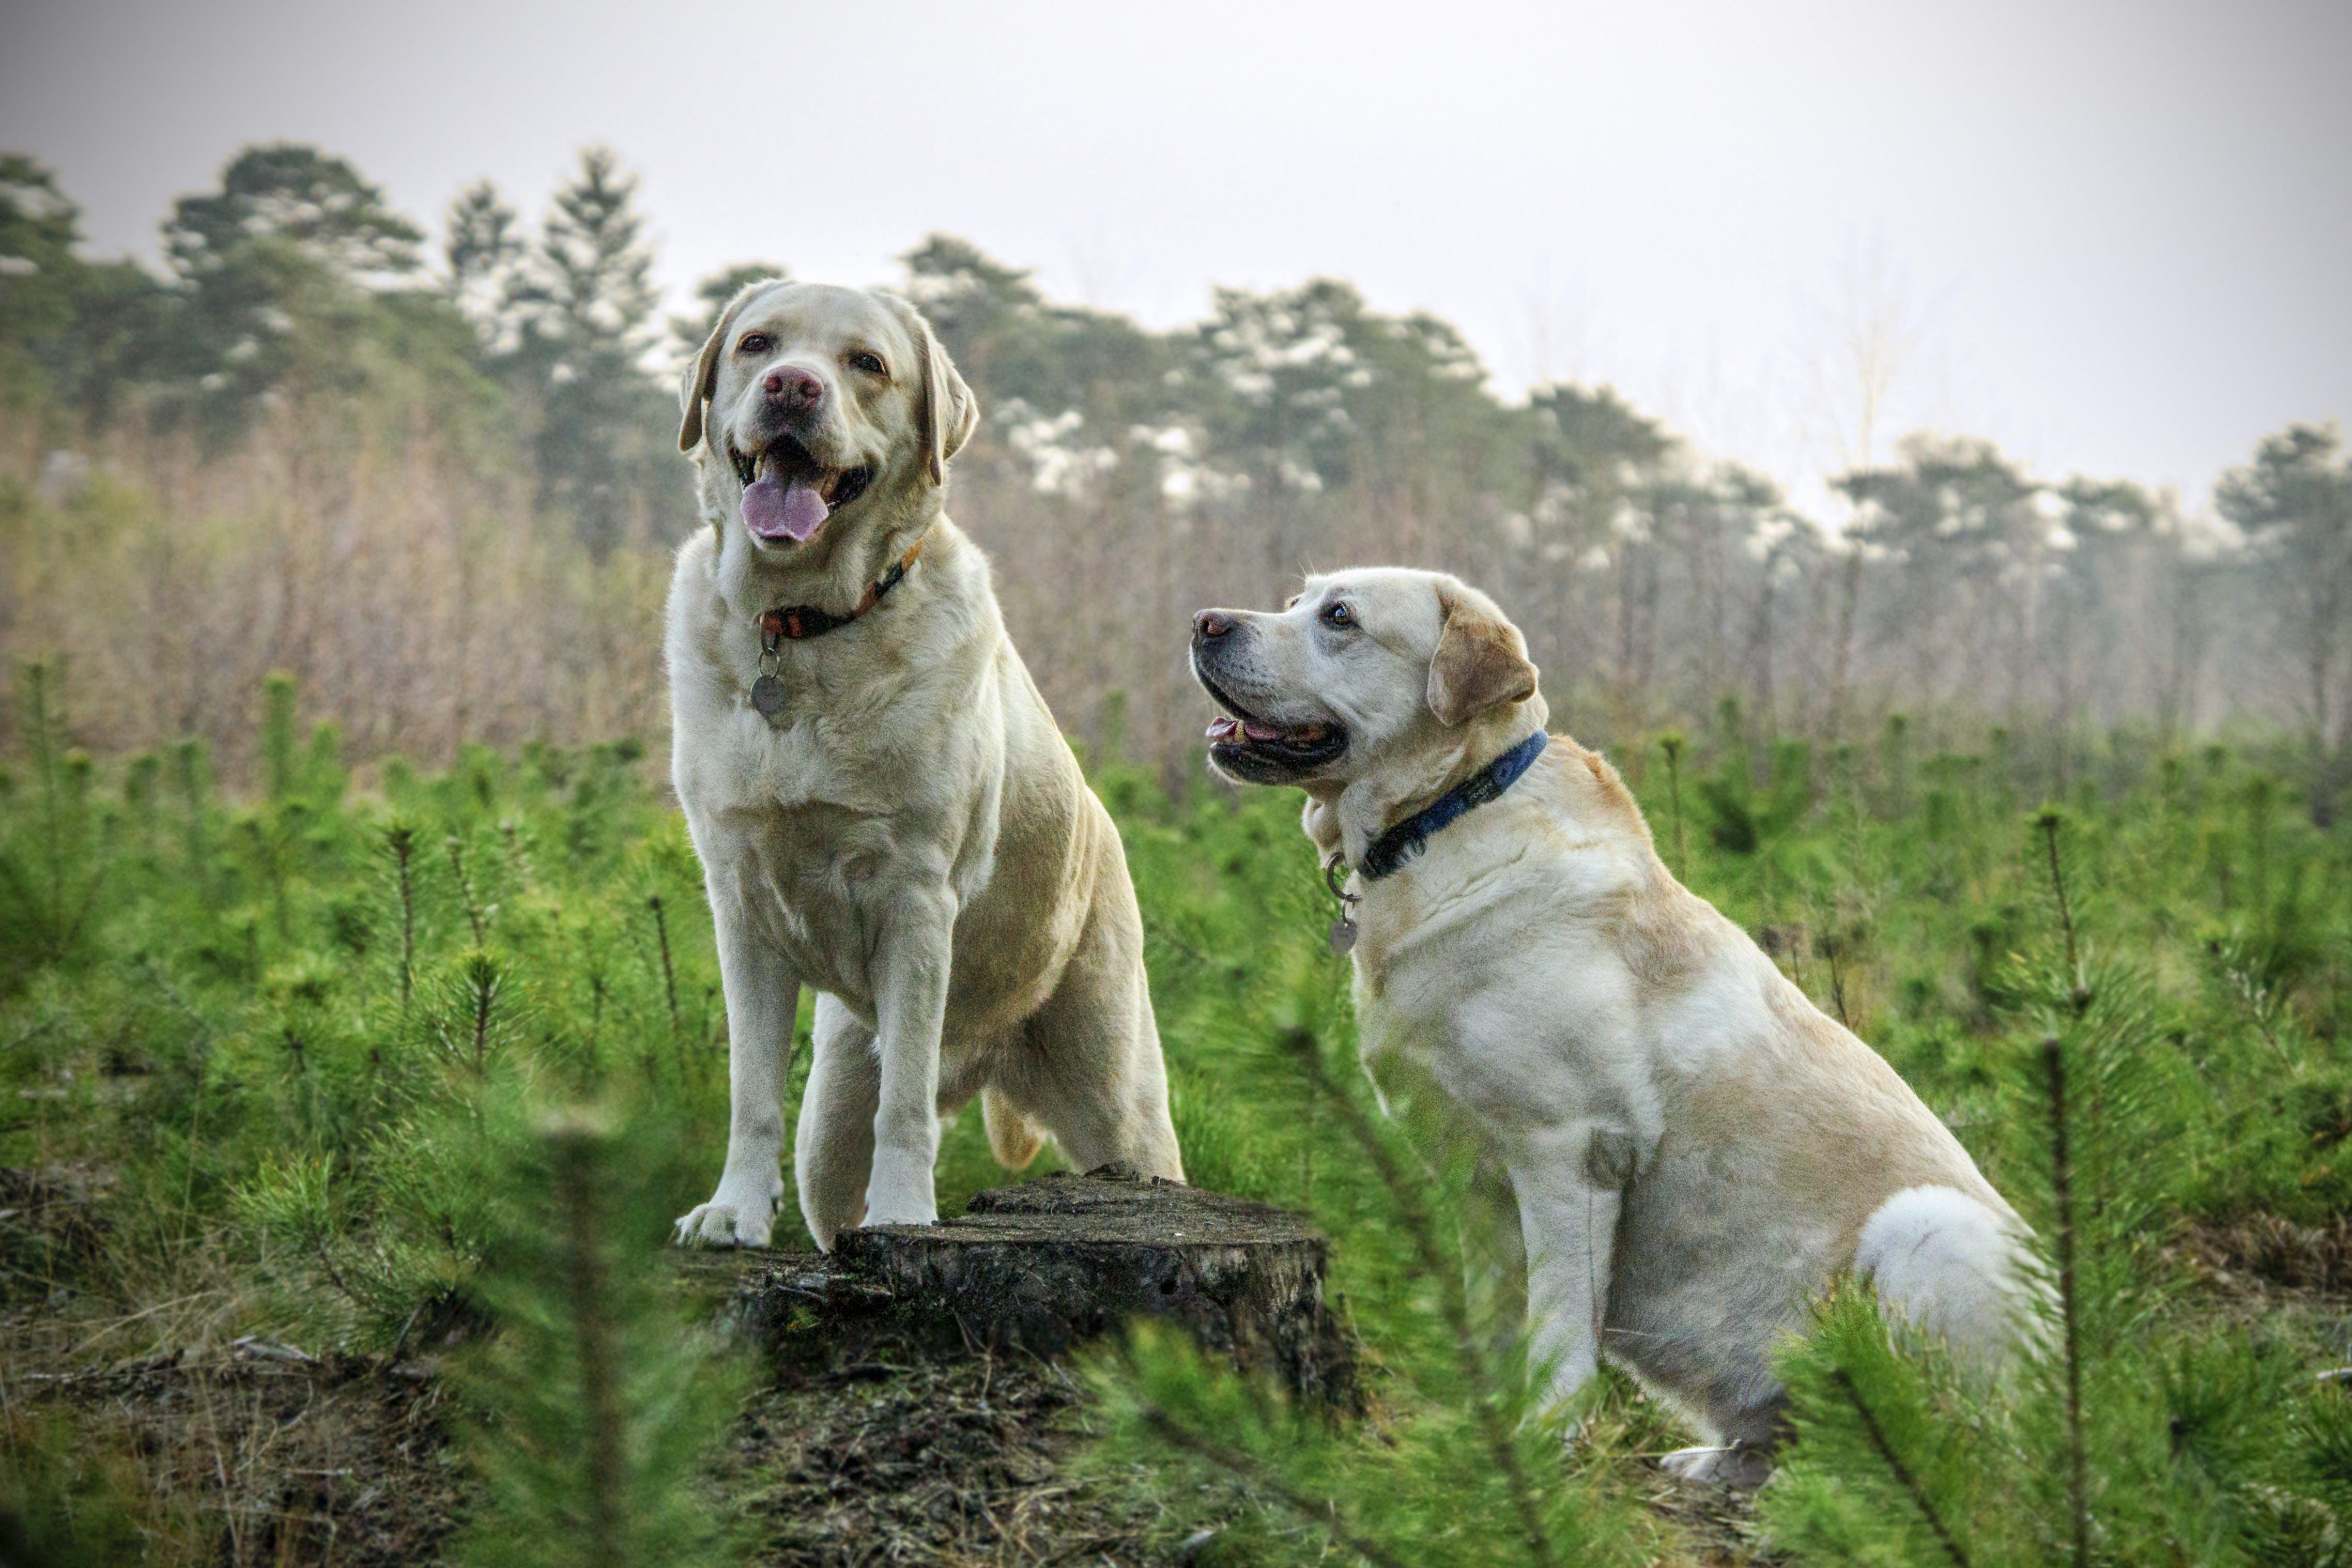 Two Adult Yellow Labrador Retrievers